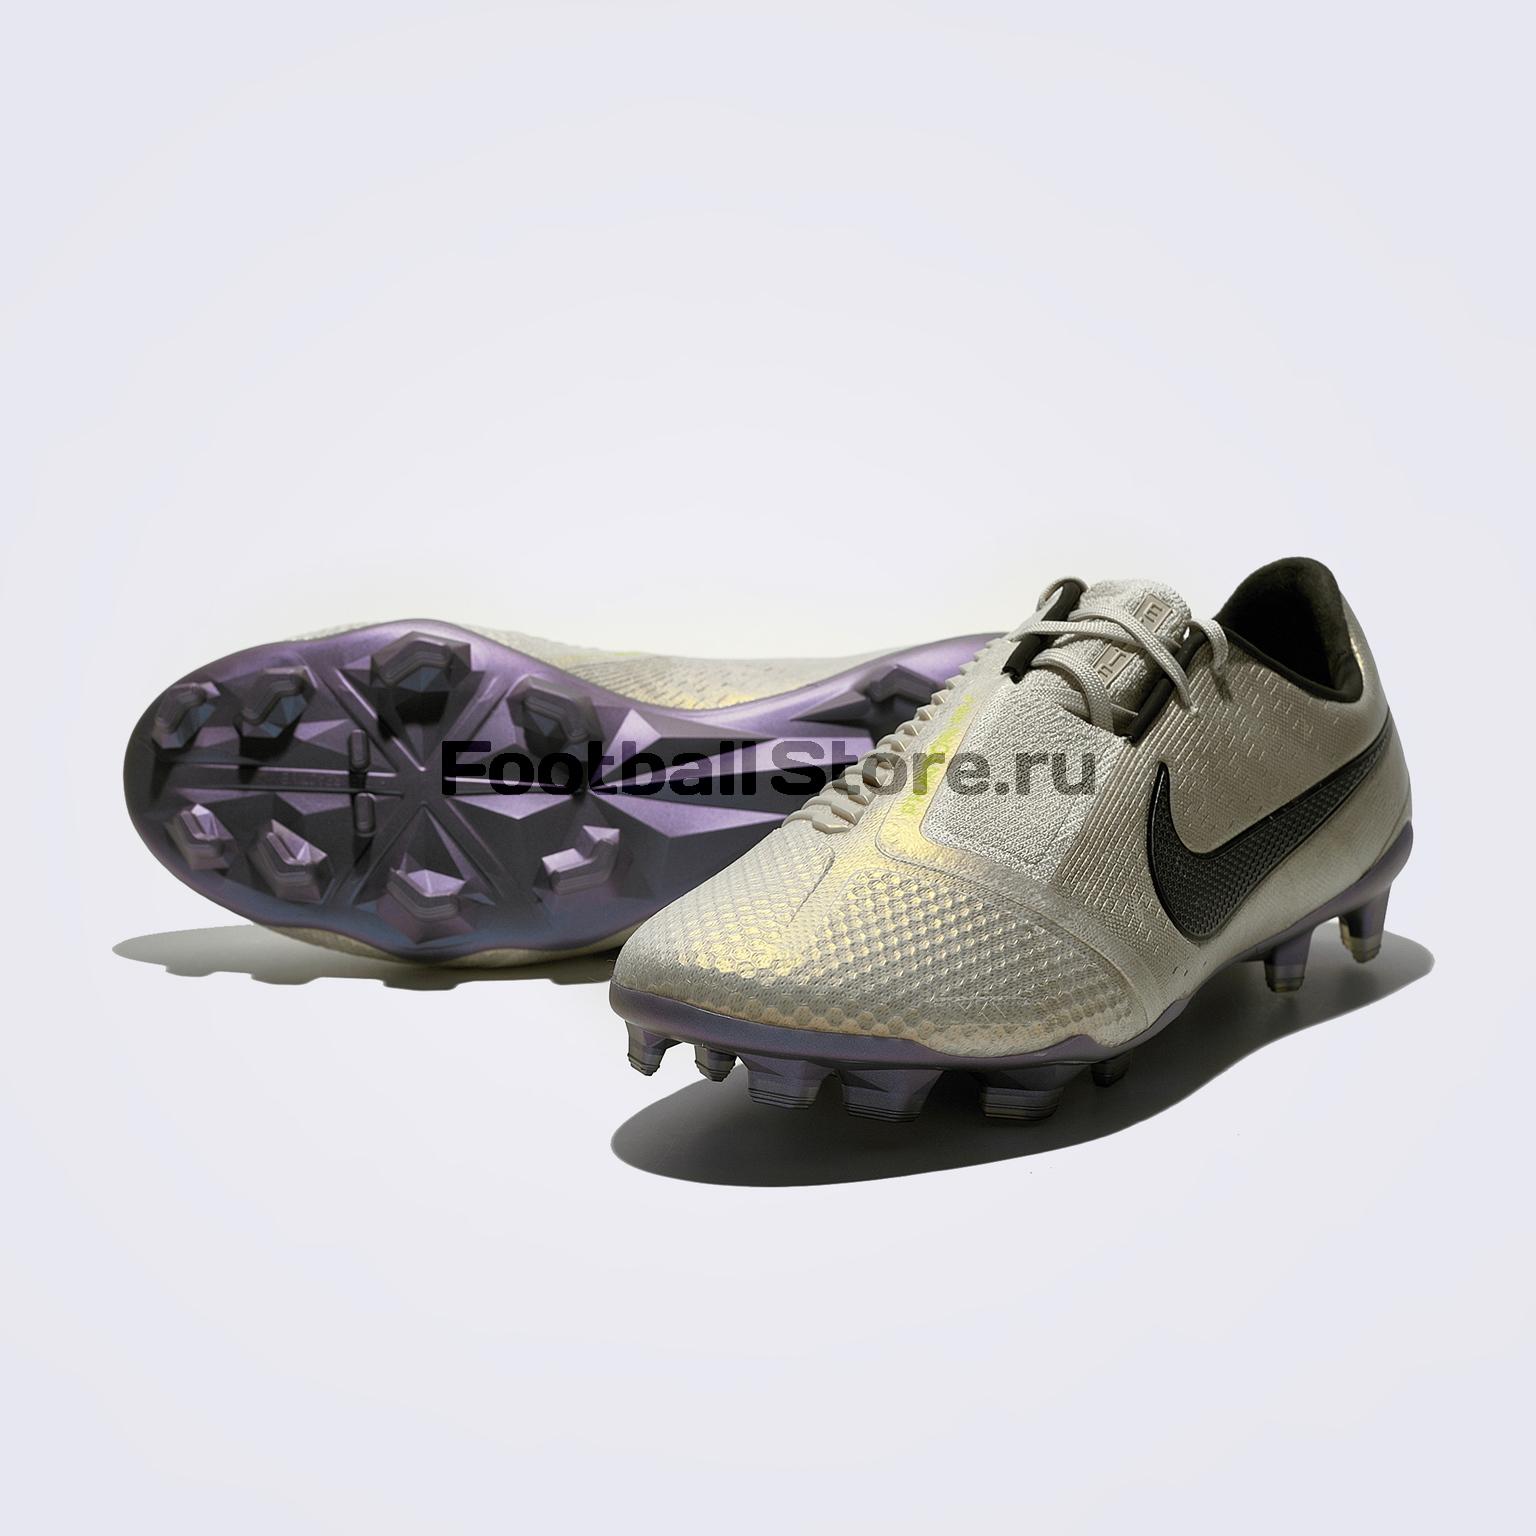 Бутсы Nike Phantom Venom Elite FG AO7540-005 цена и фото